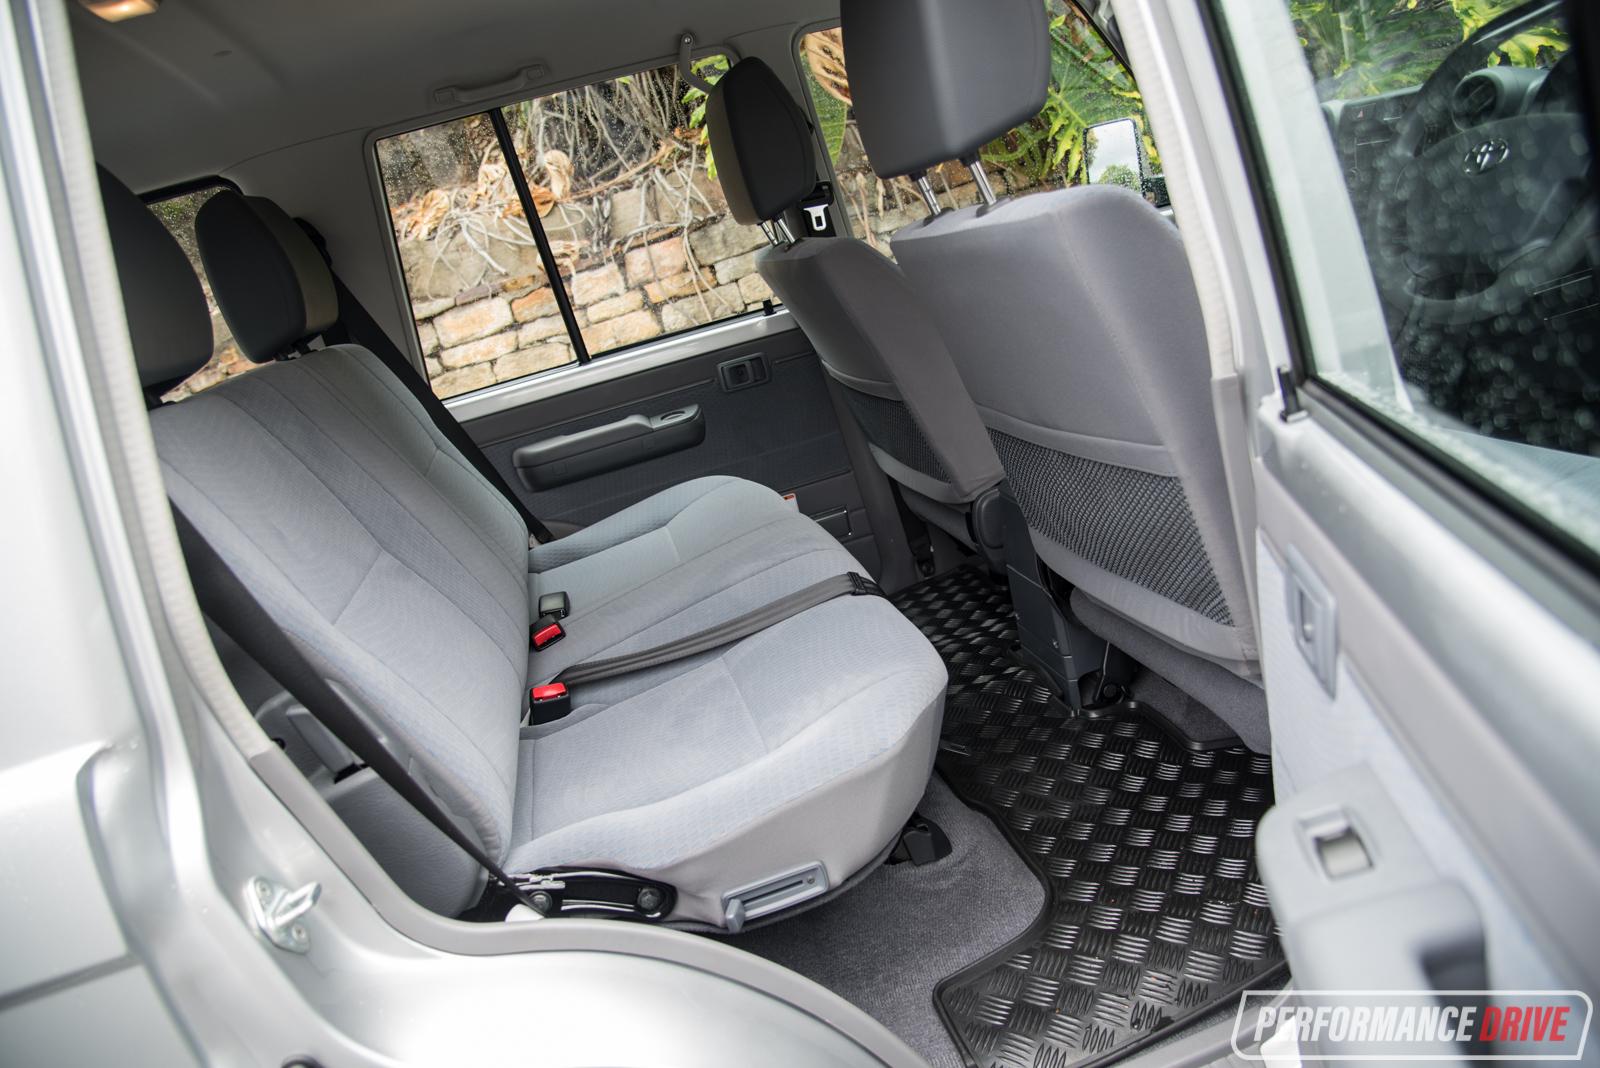 2017 Toyota Land Cruiser Towing Capacity >> 2017 Toyota LandCruiser 70 Series GXL wagon review (video) | PerformanceDrive